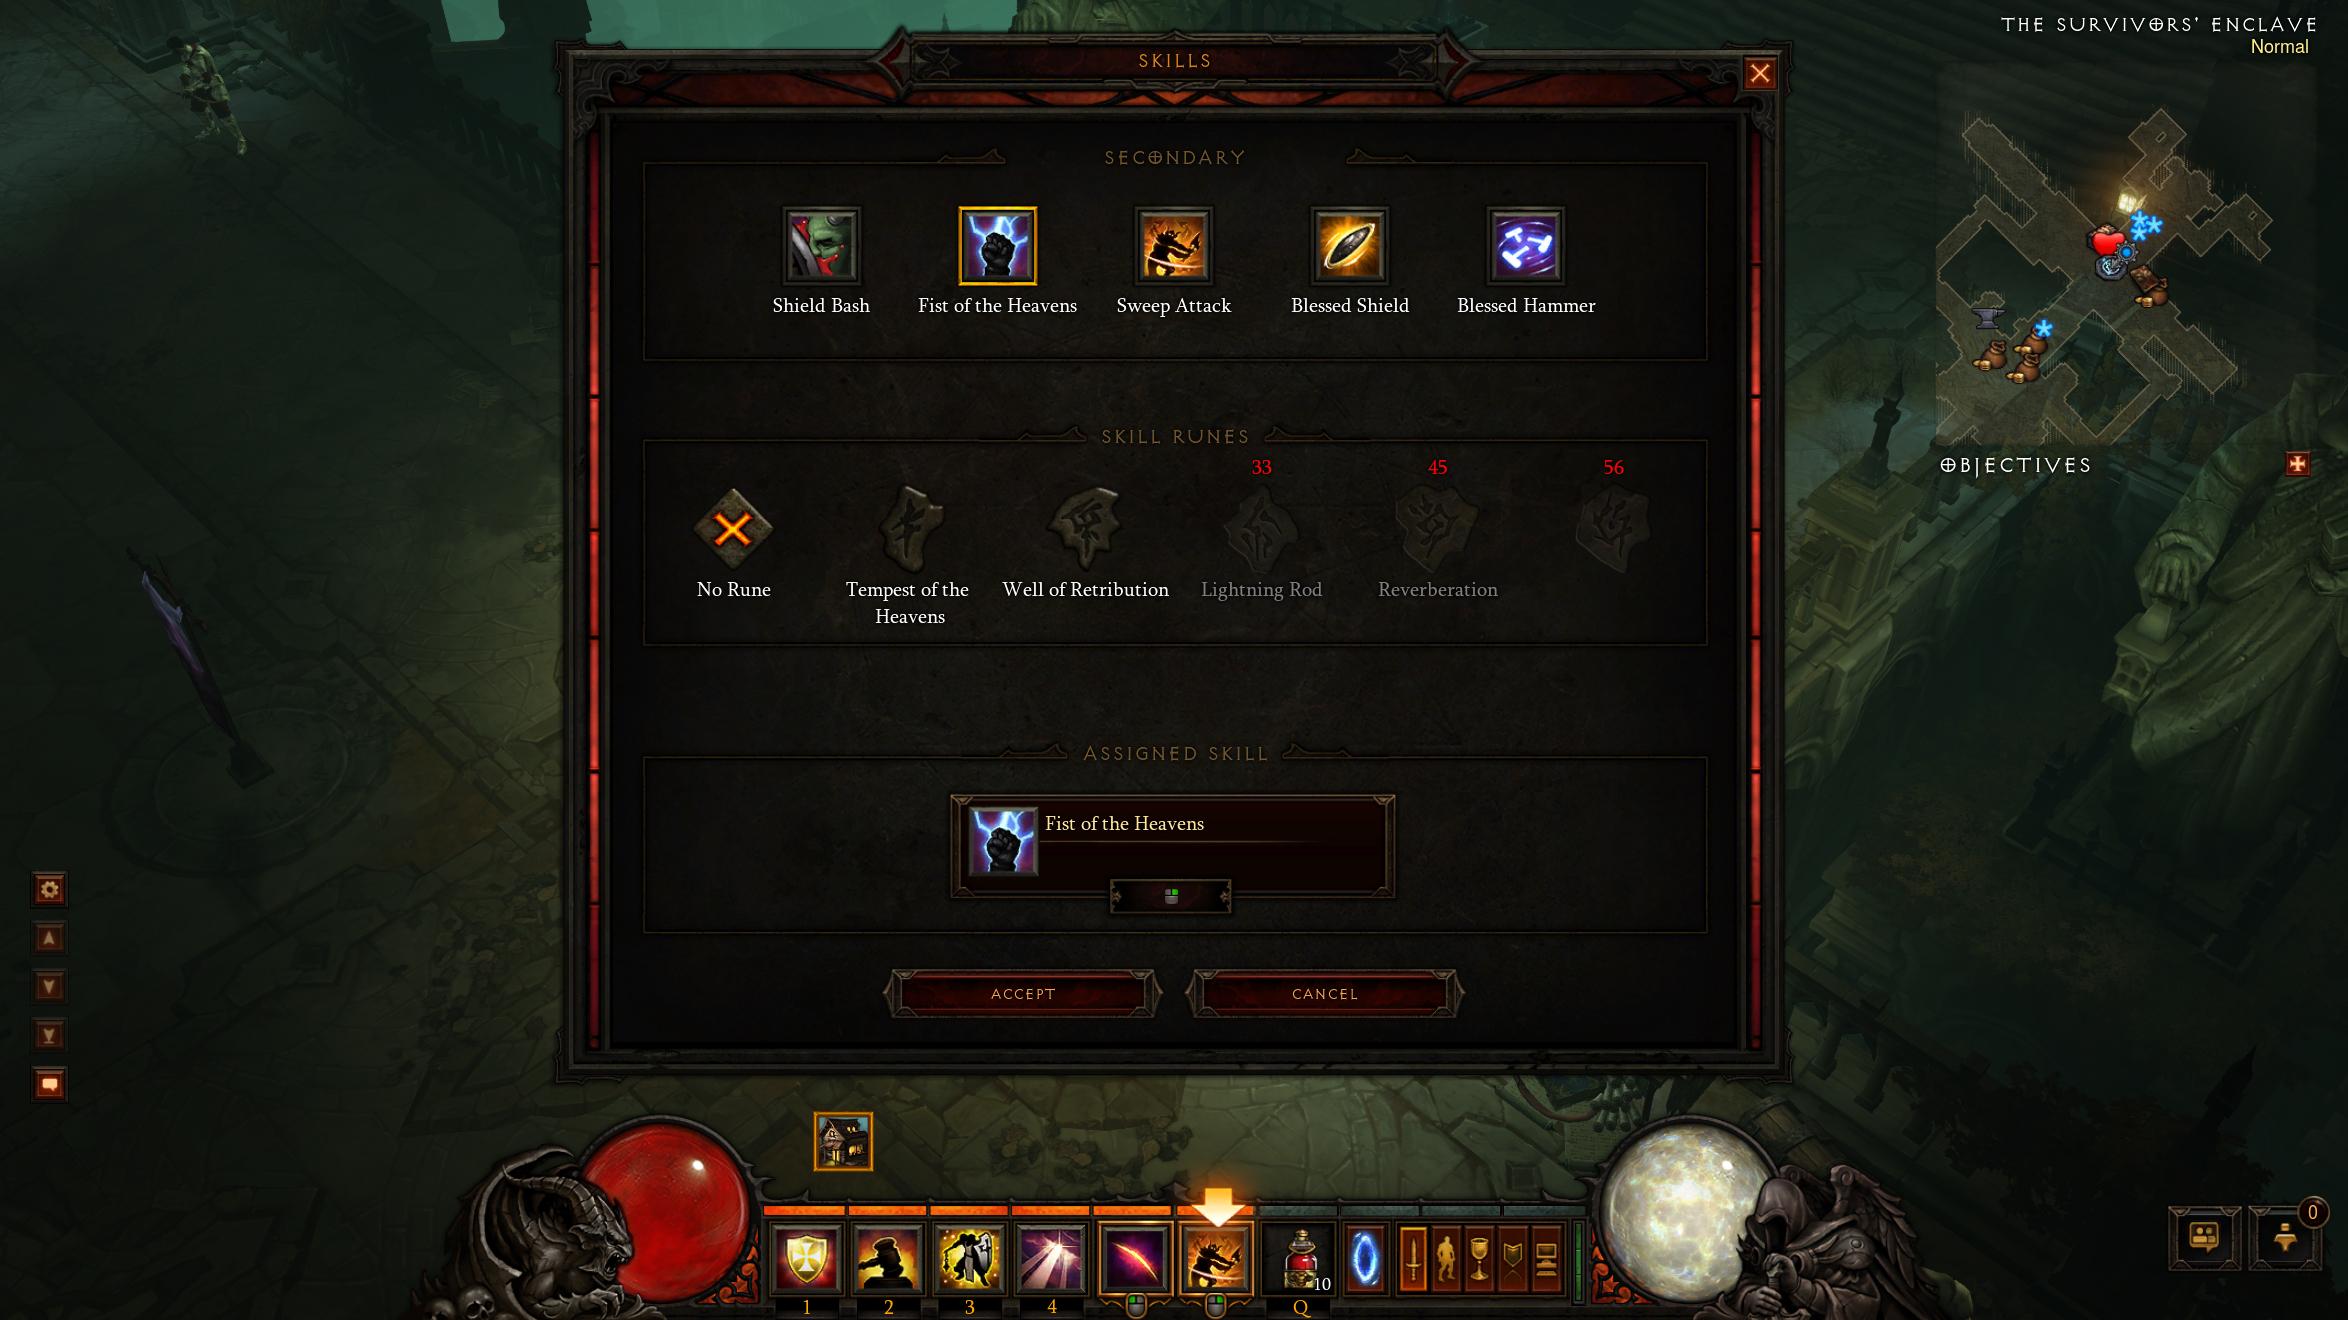 Reaper of souls nouvelle extension de Diablo III 150188813